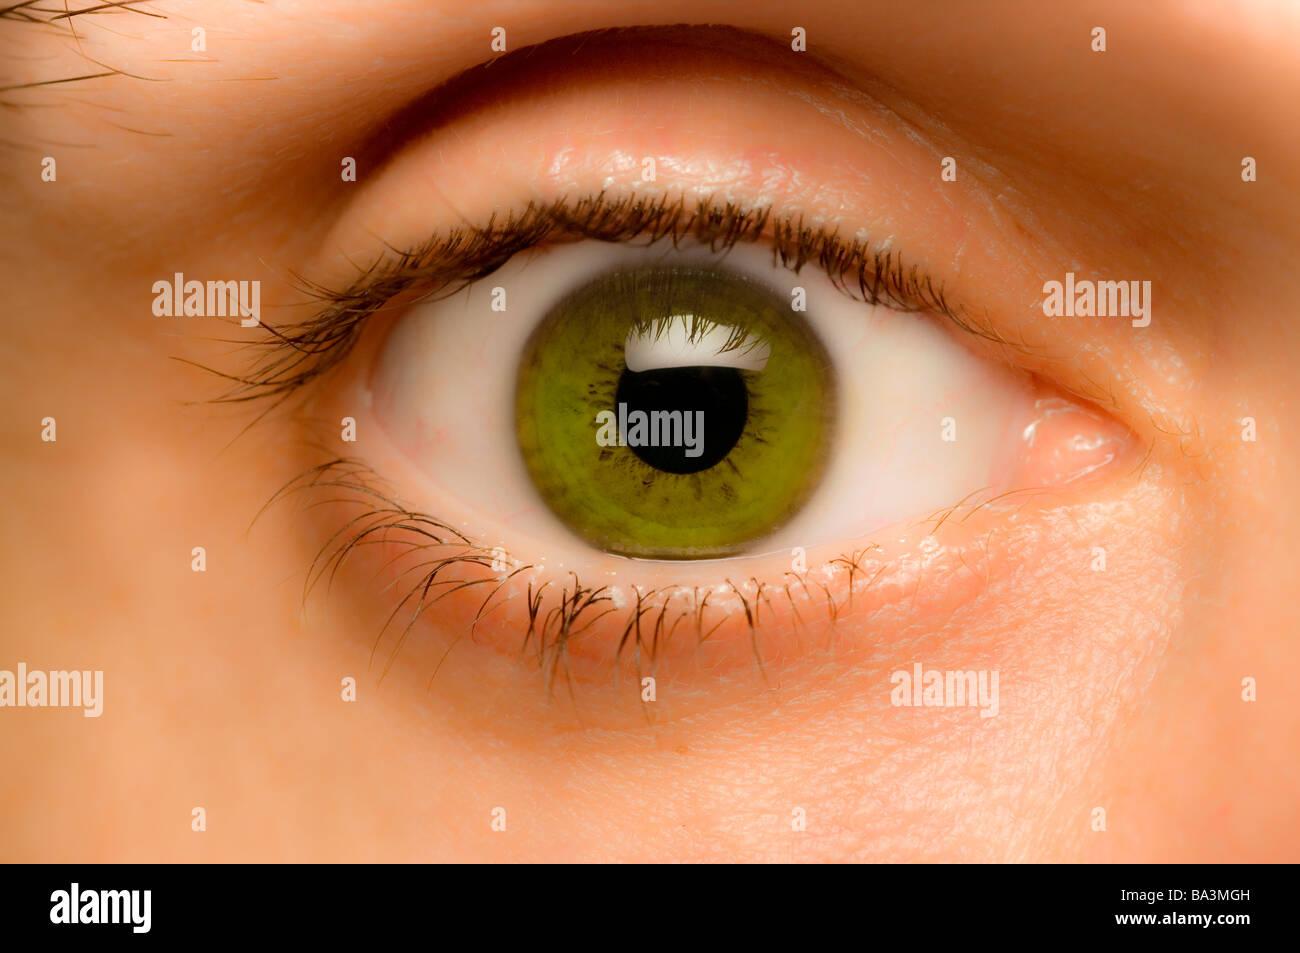 green eye - Stock Image